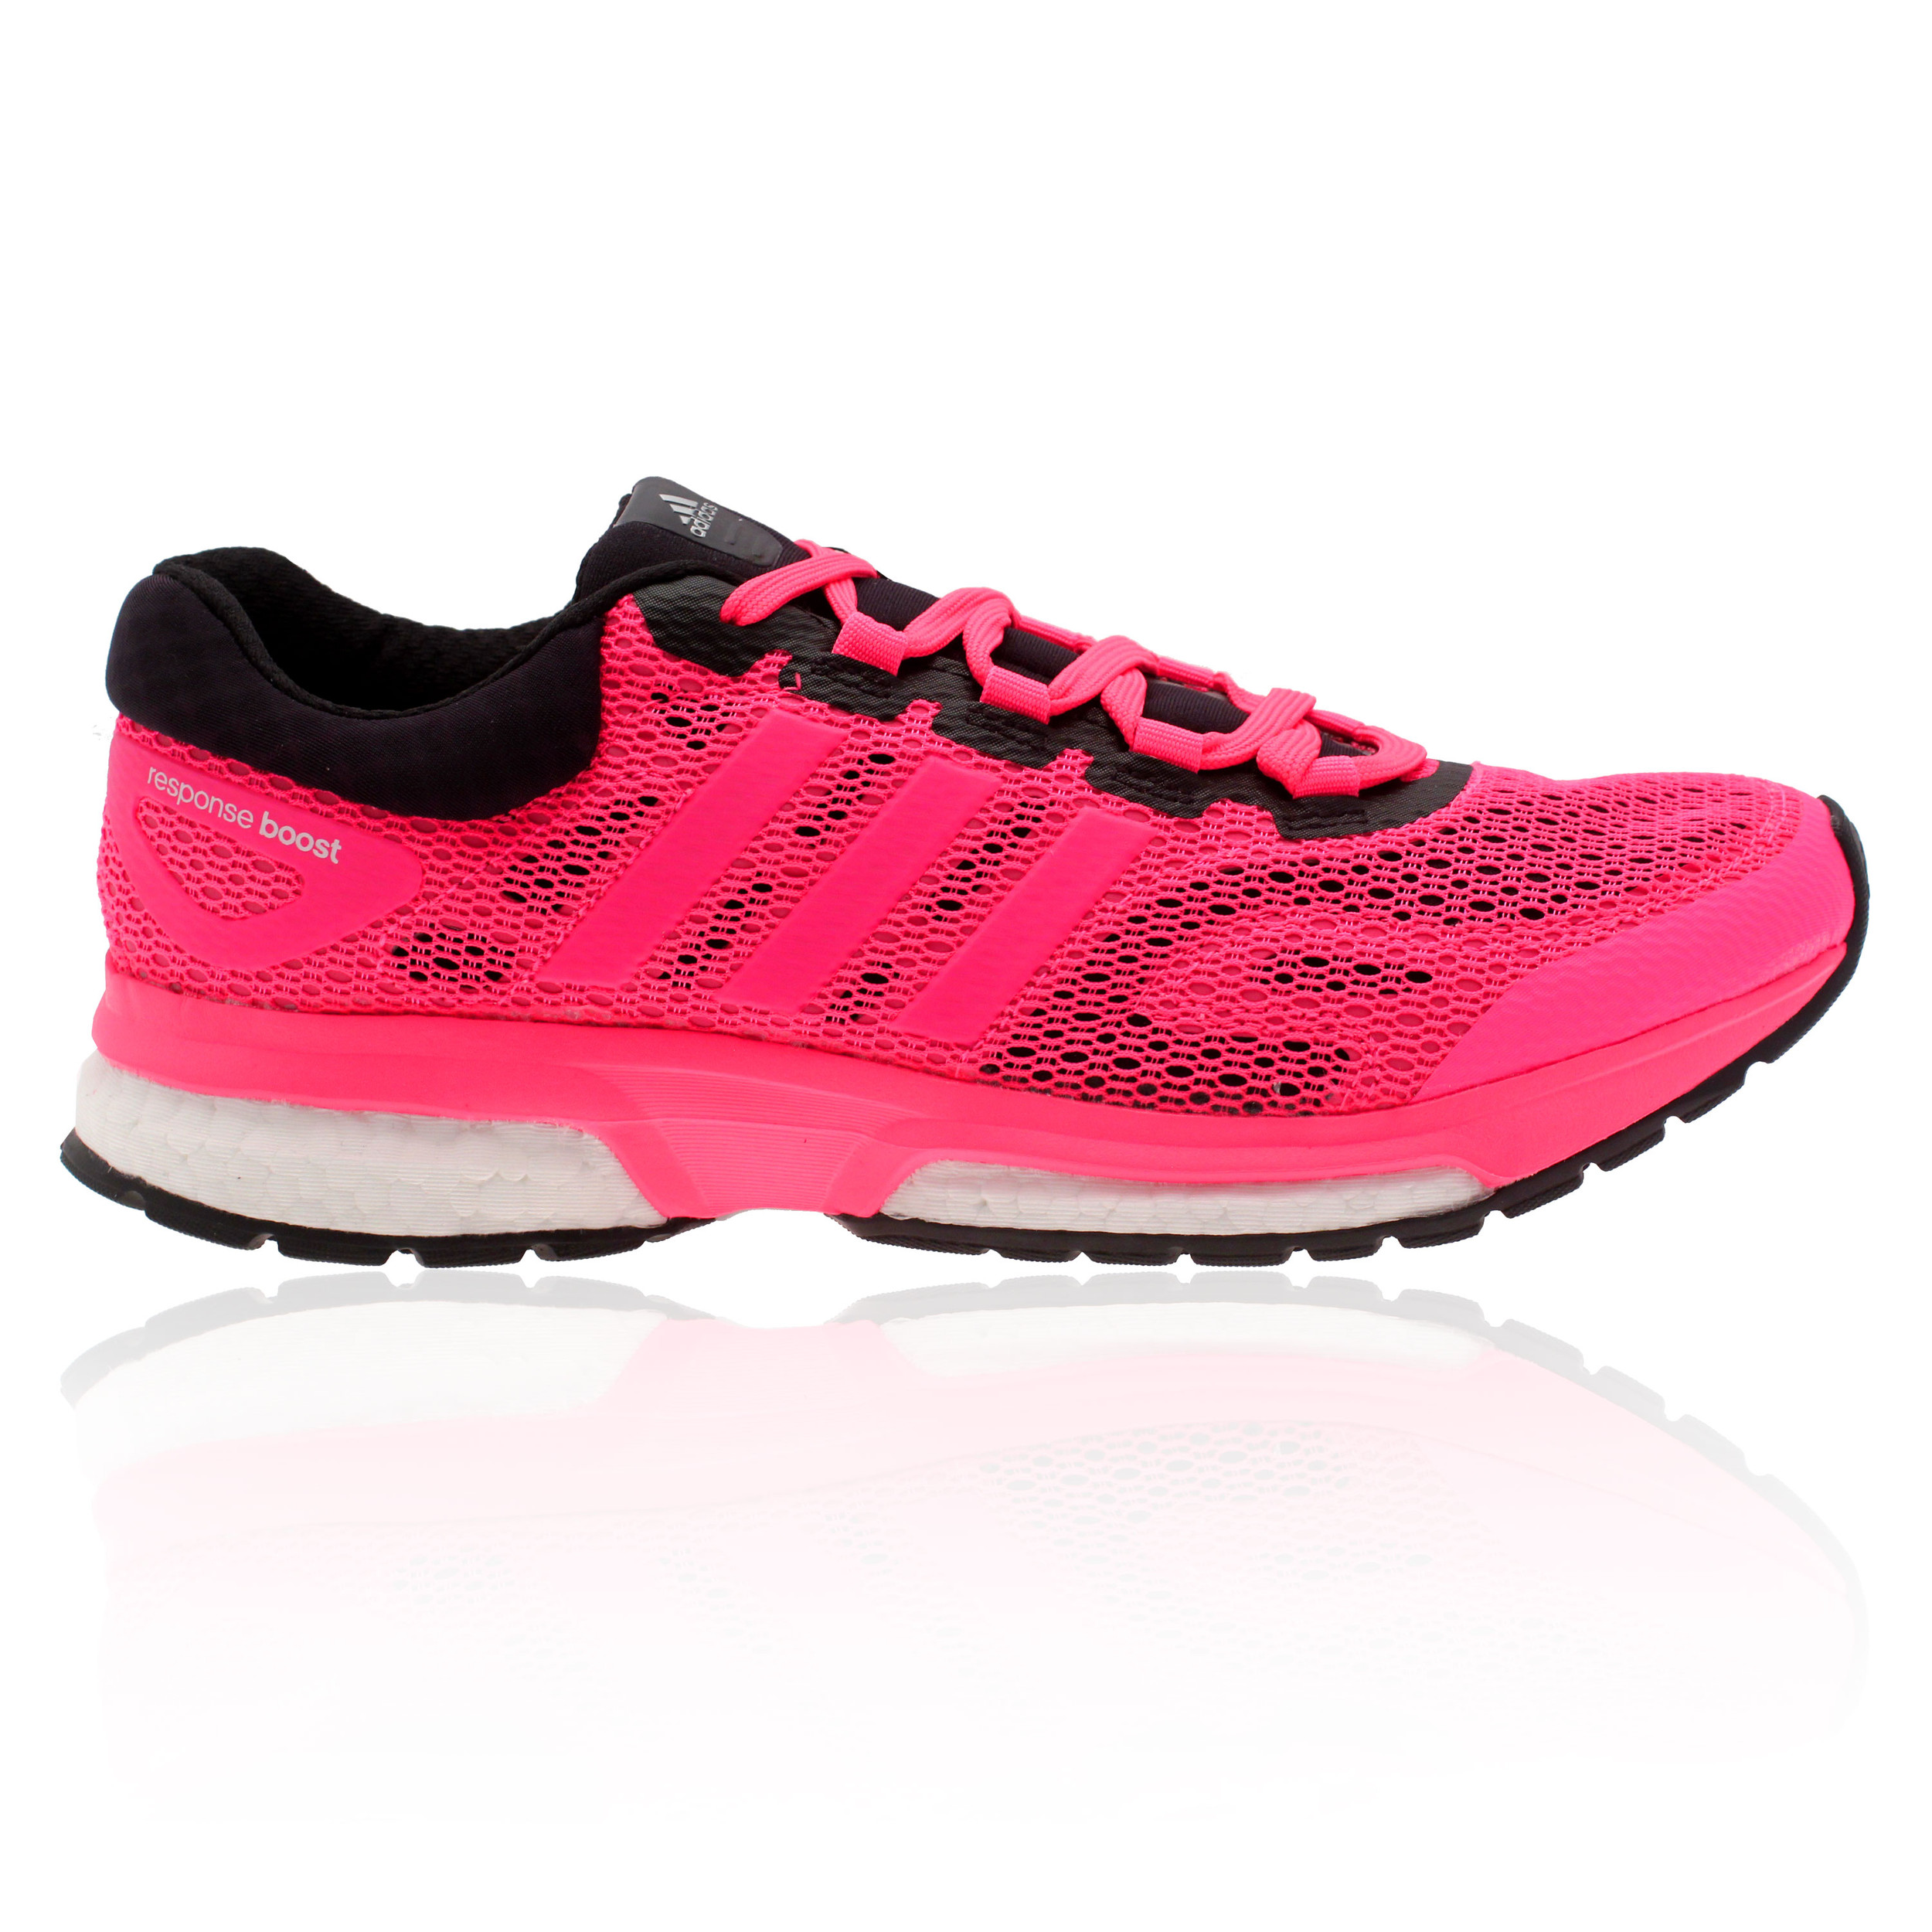 Adidas Boost Running Shoes Response